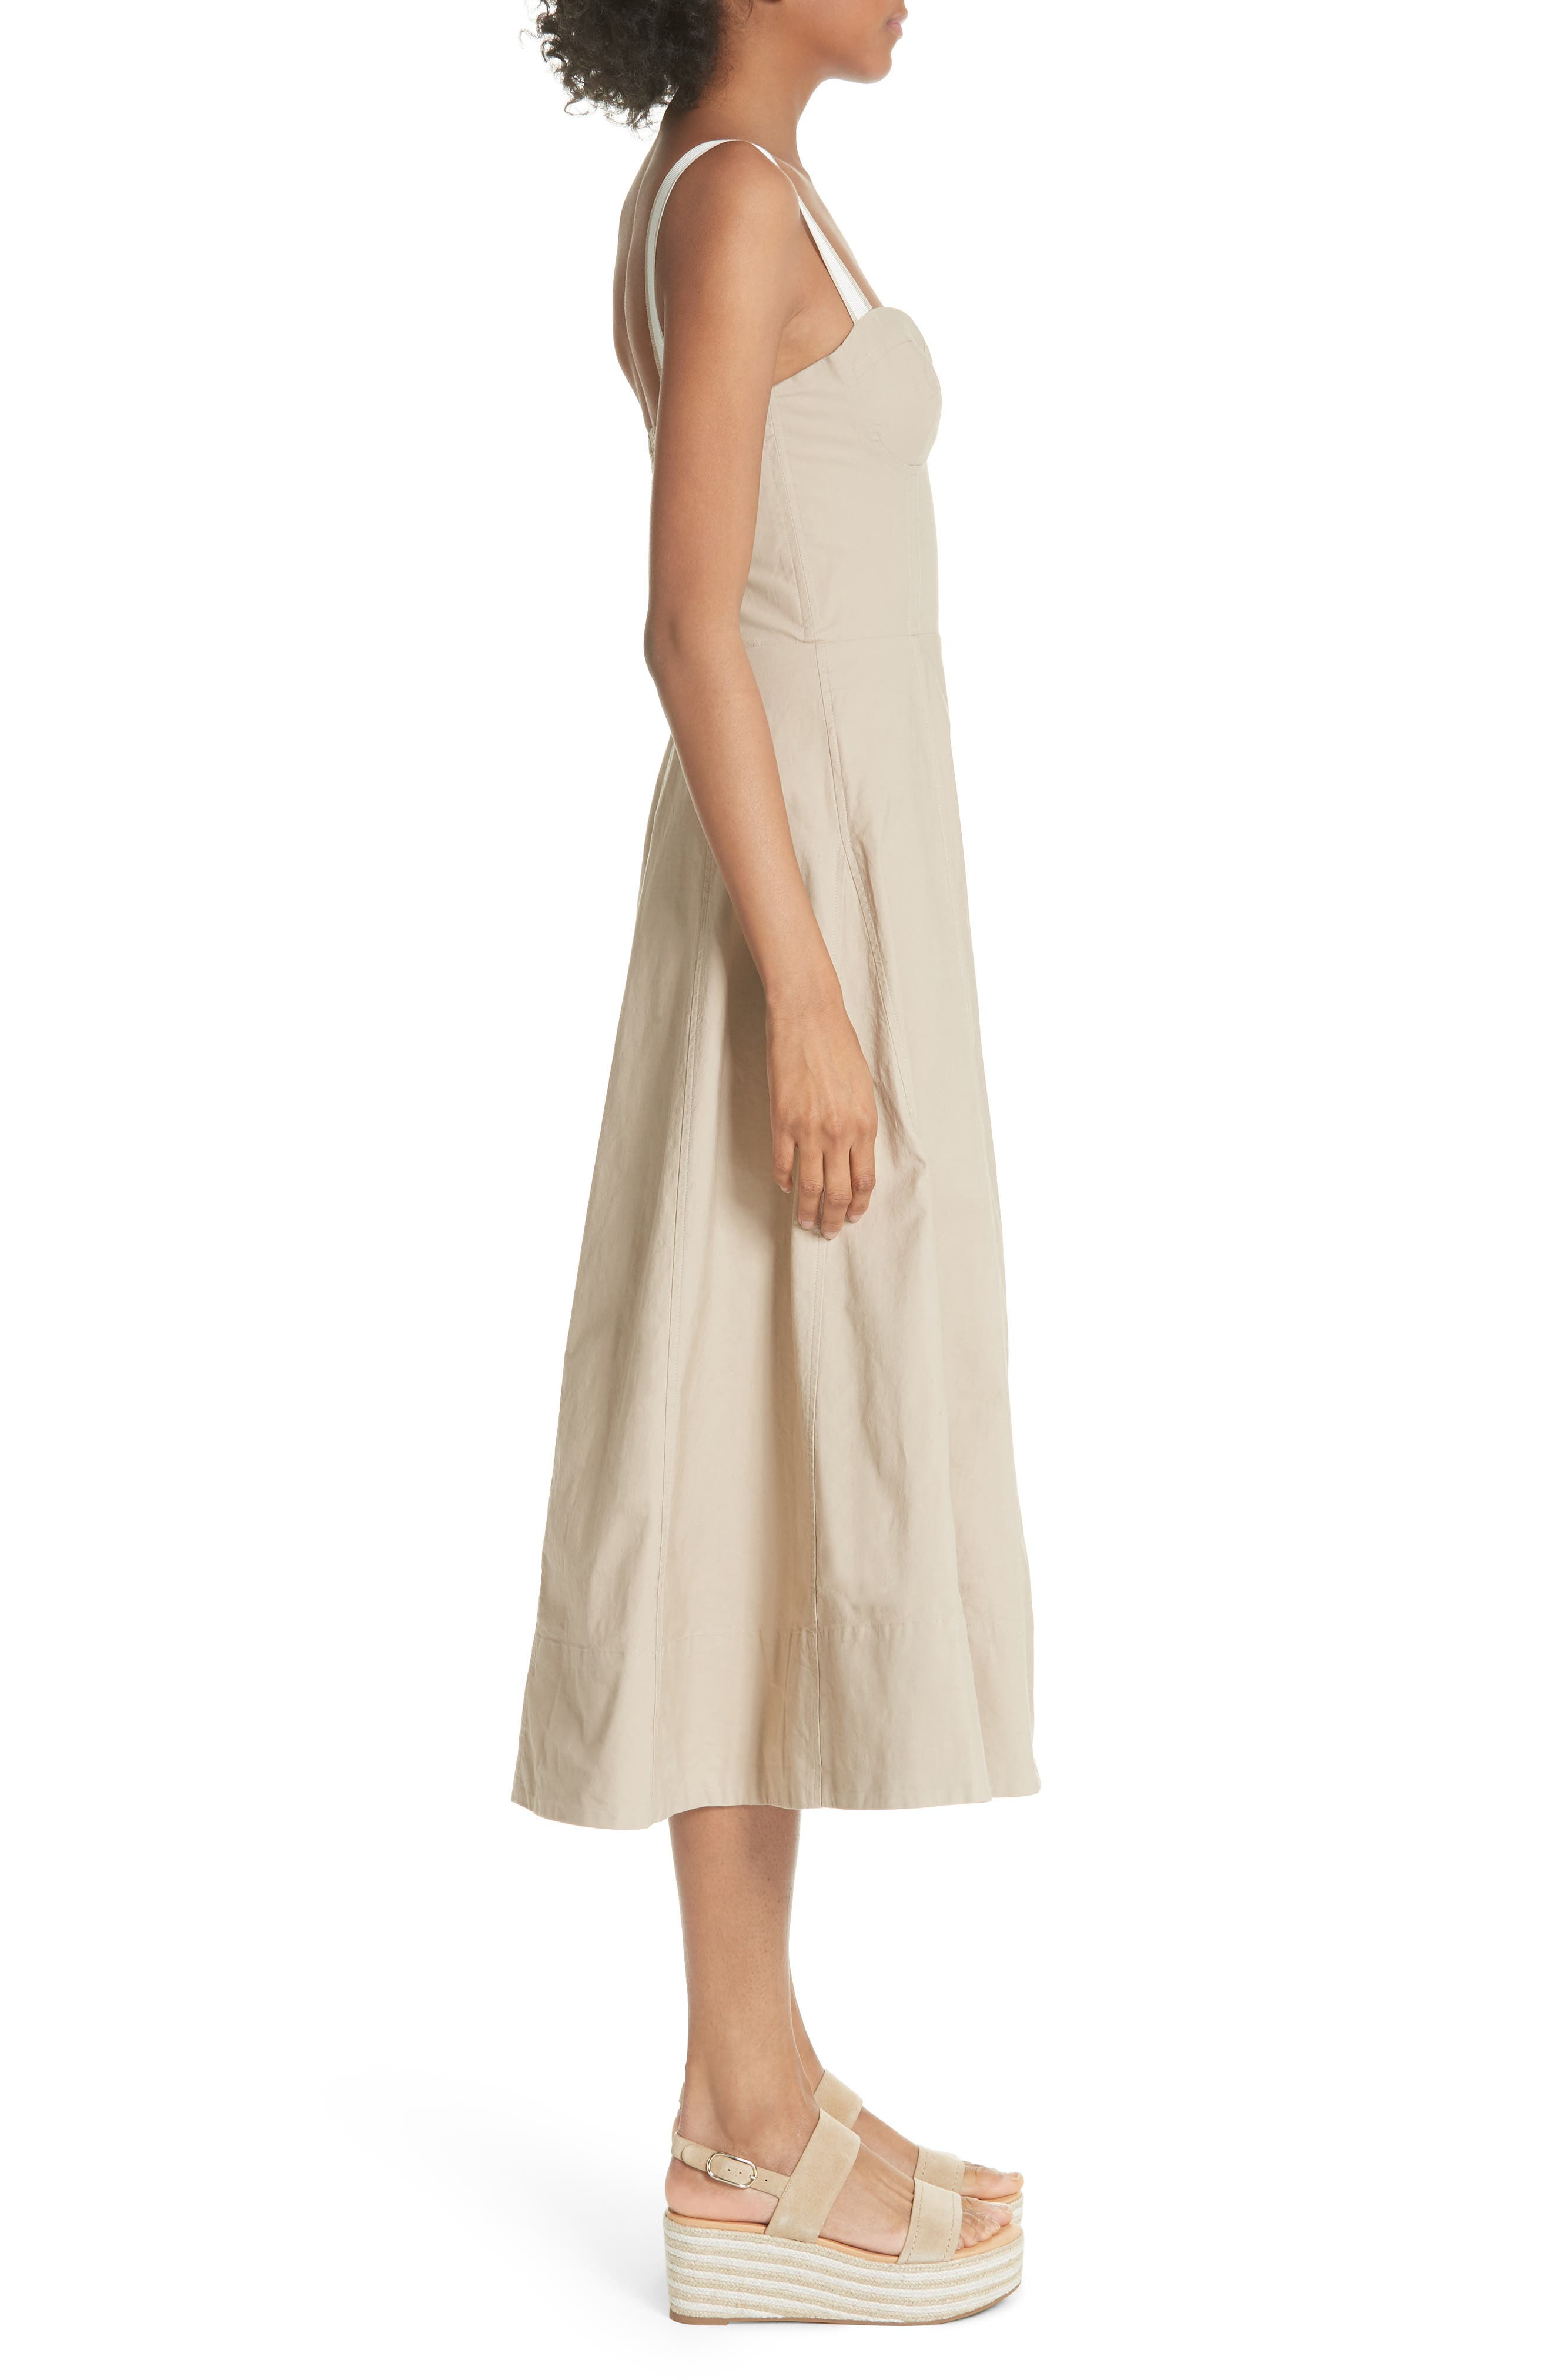 Briel Midi Dress,                             Alternate thumbnail 3, color,                             253